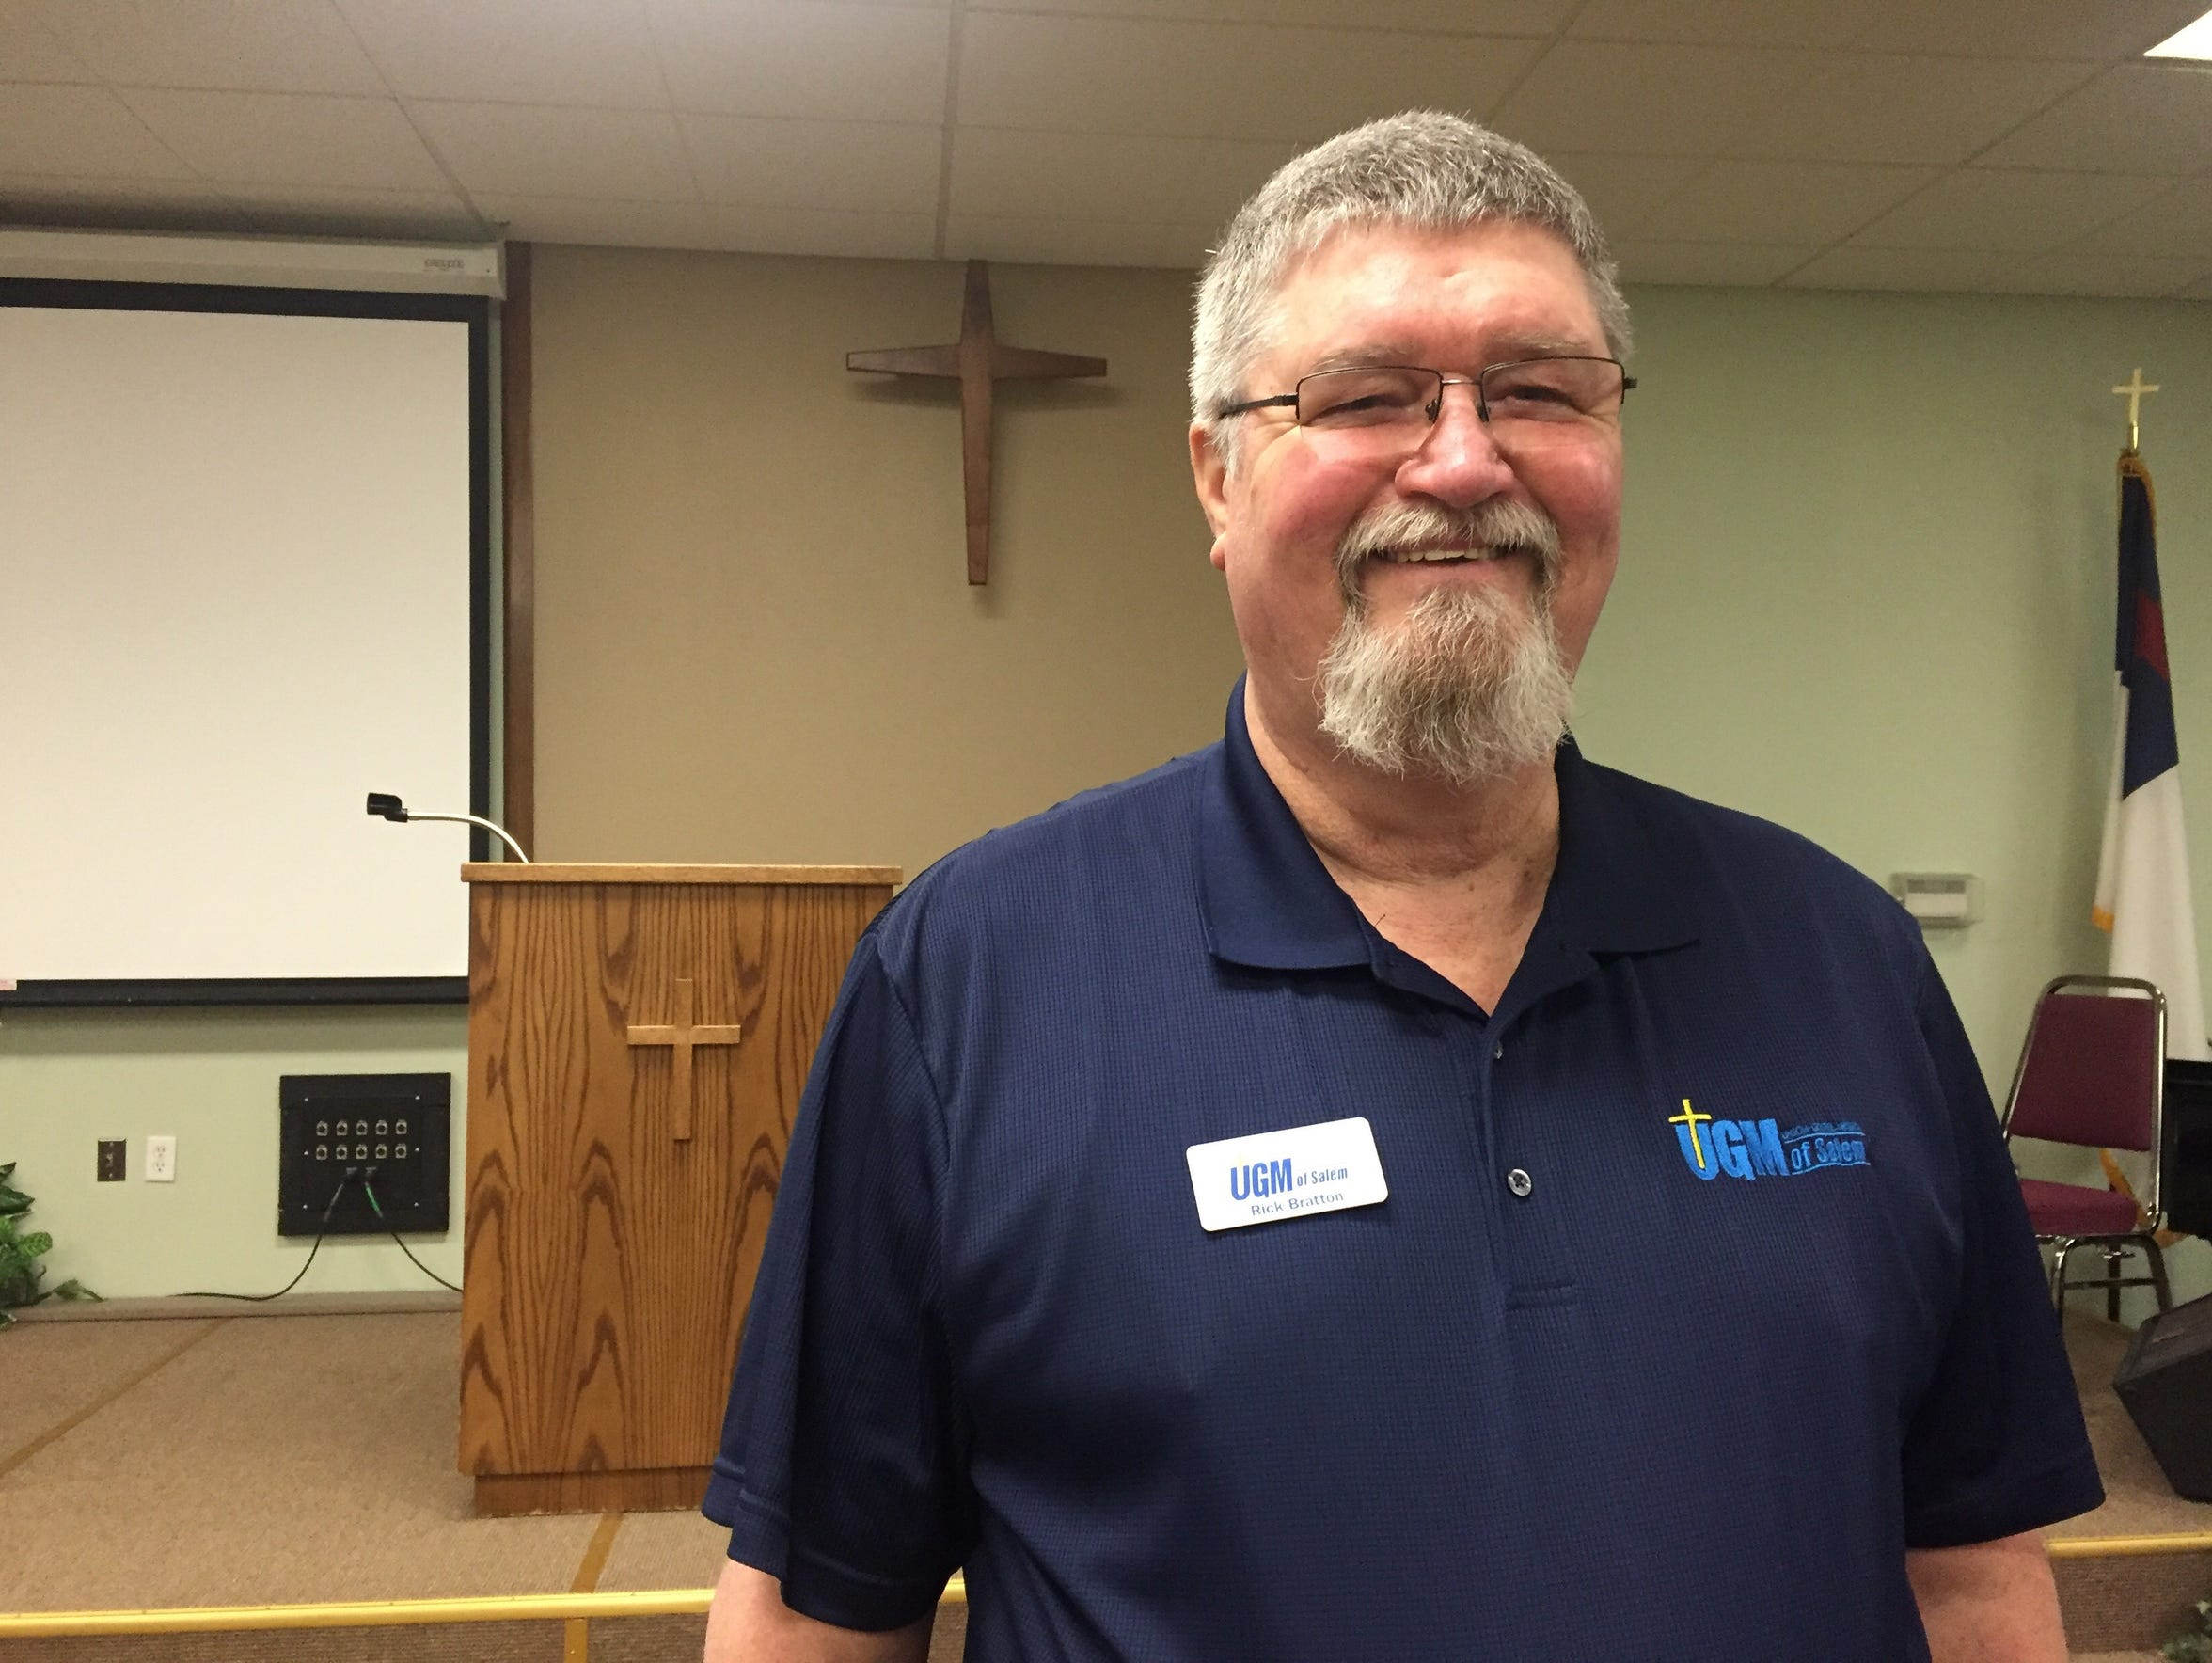 Rick Bratton, Union Gospel Mission guest services manager.